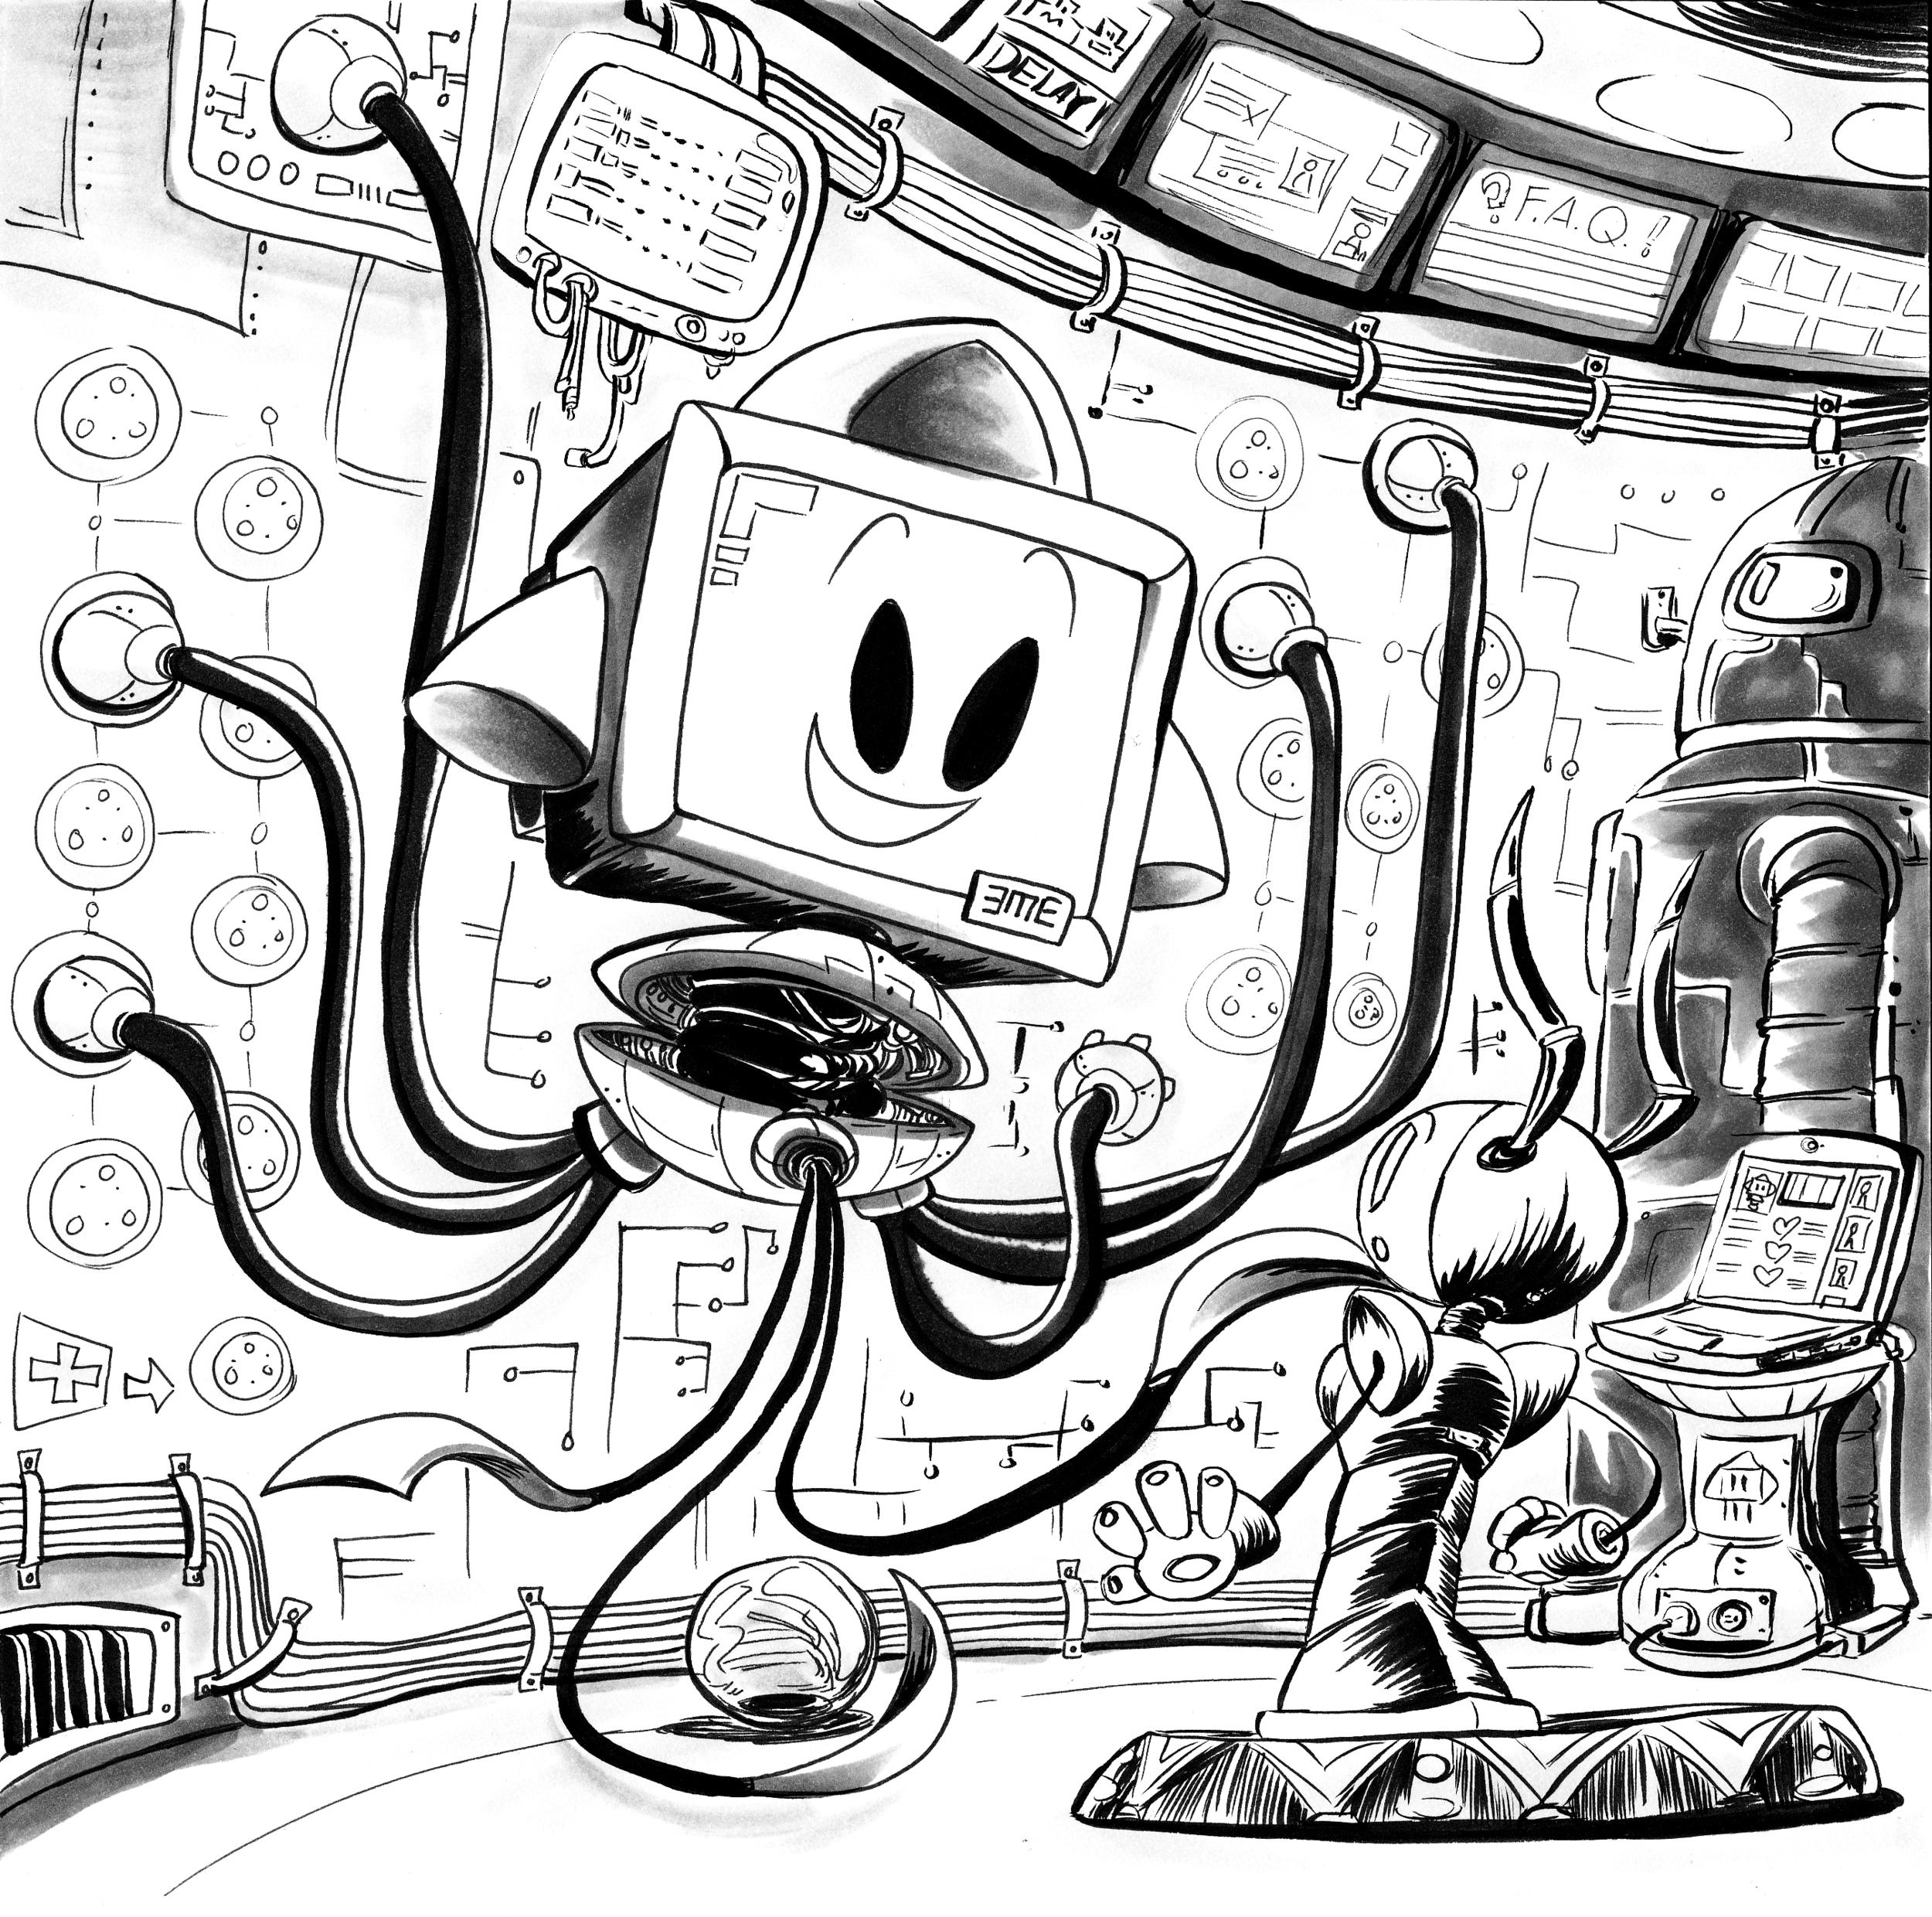 moonbot2-2 final.png